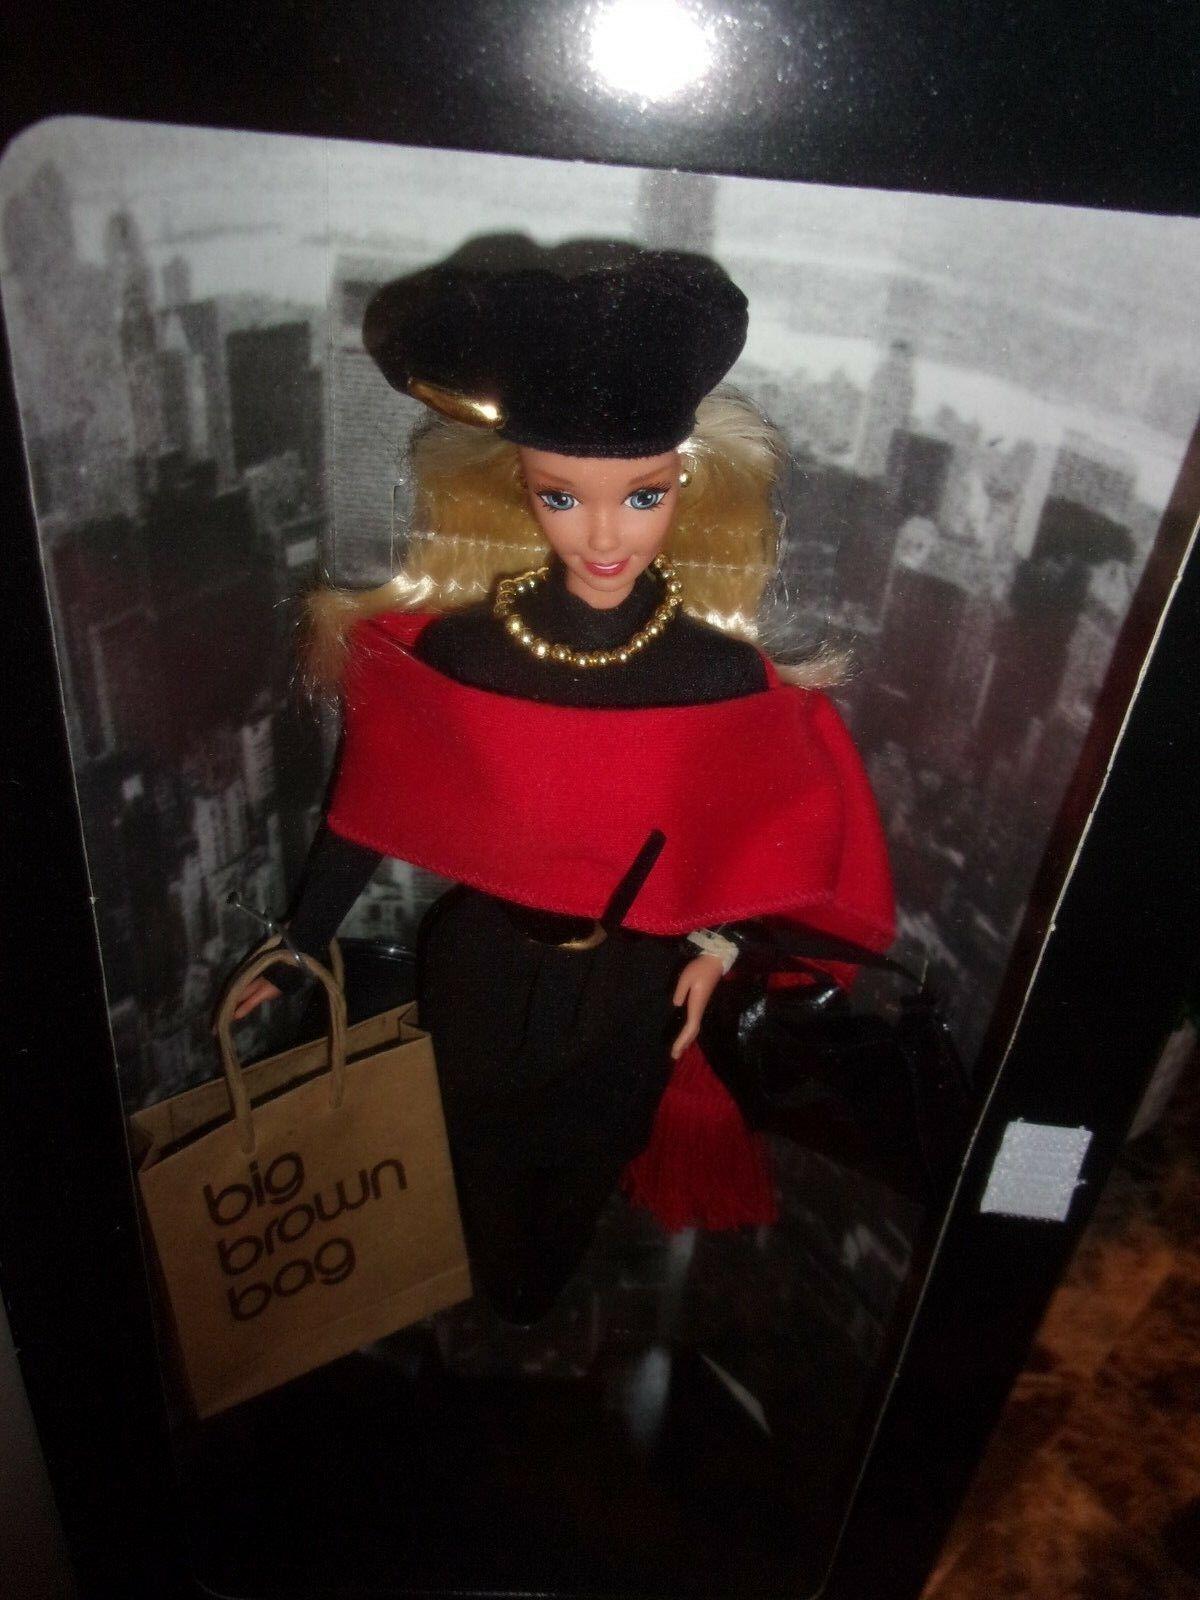 Mattel Barbie mujer Karan New York Bloomingdales Limited Edition 1995 nunca quitado de la caja